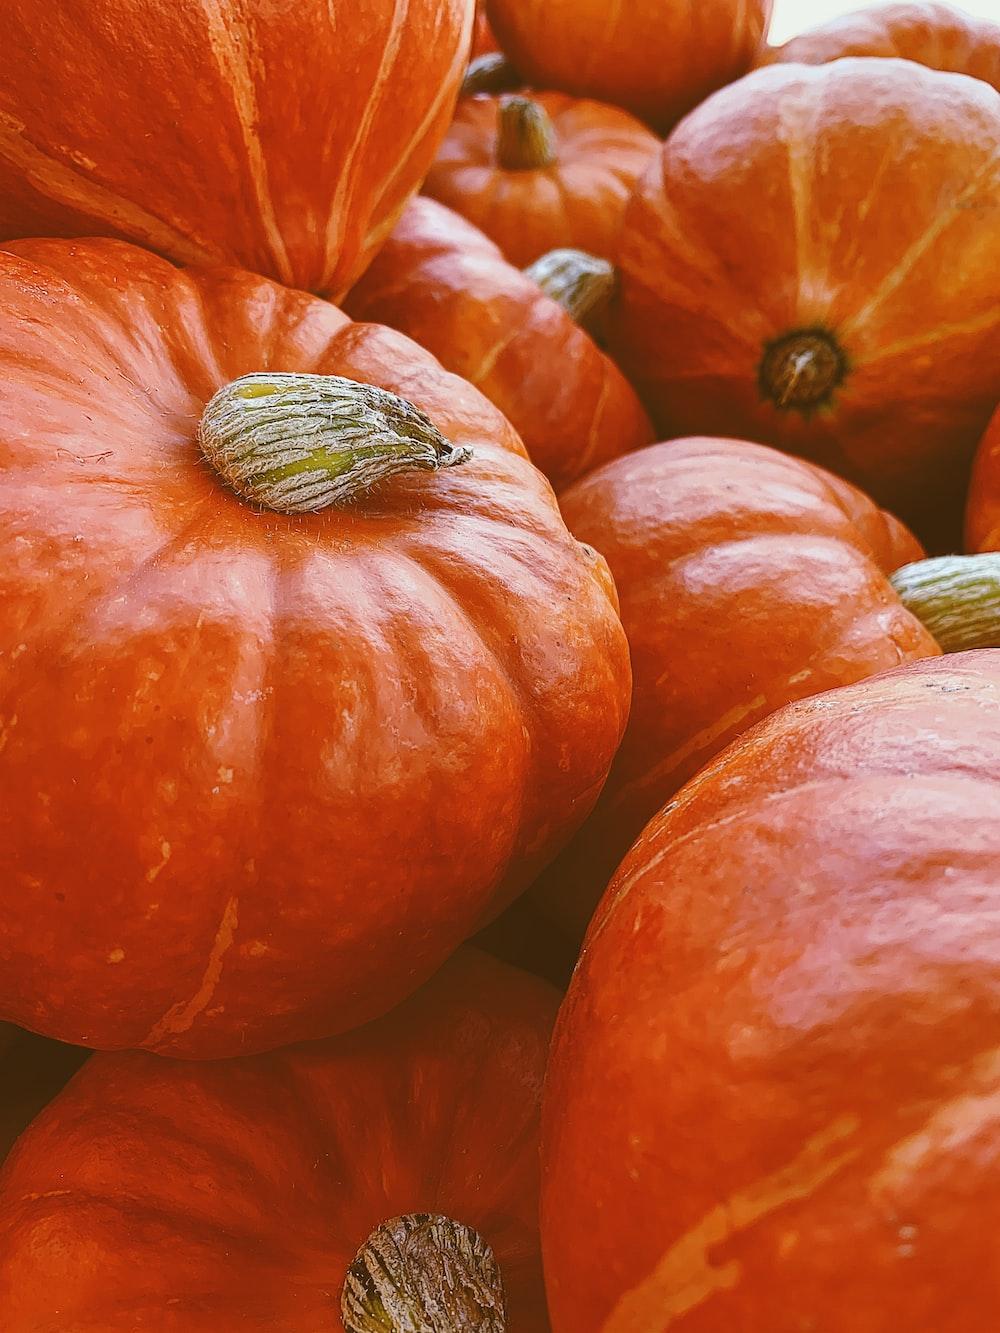 orange round fruit in close up photography